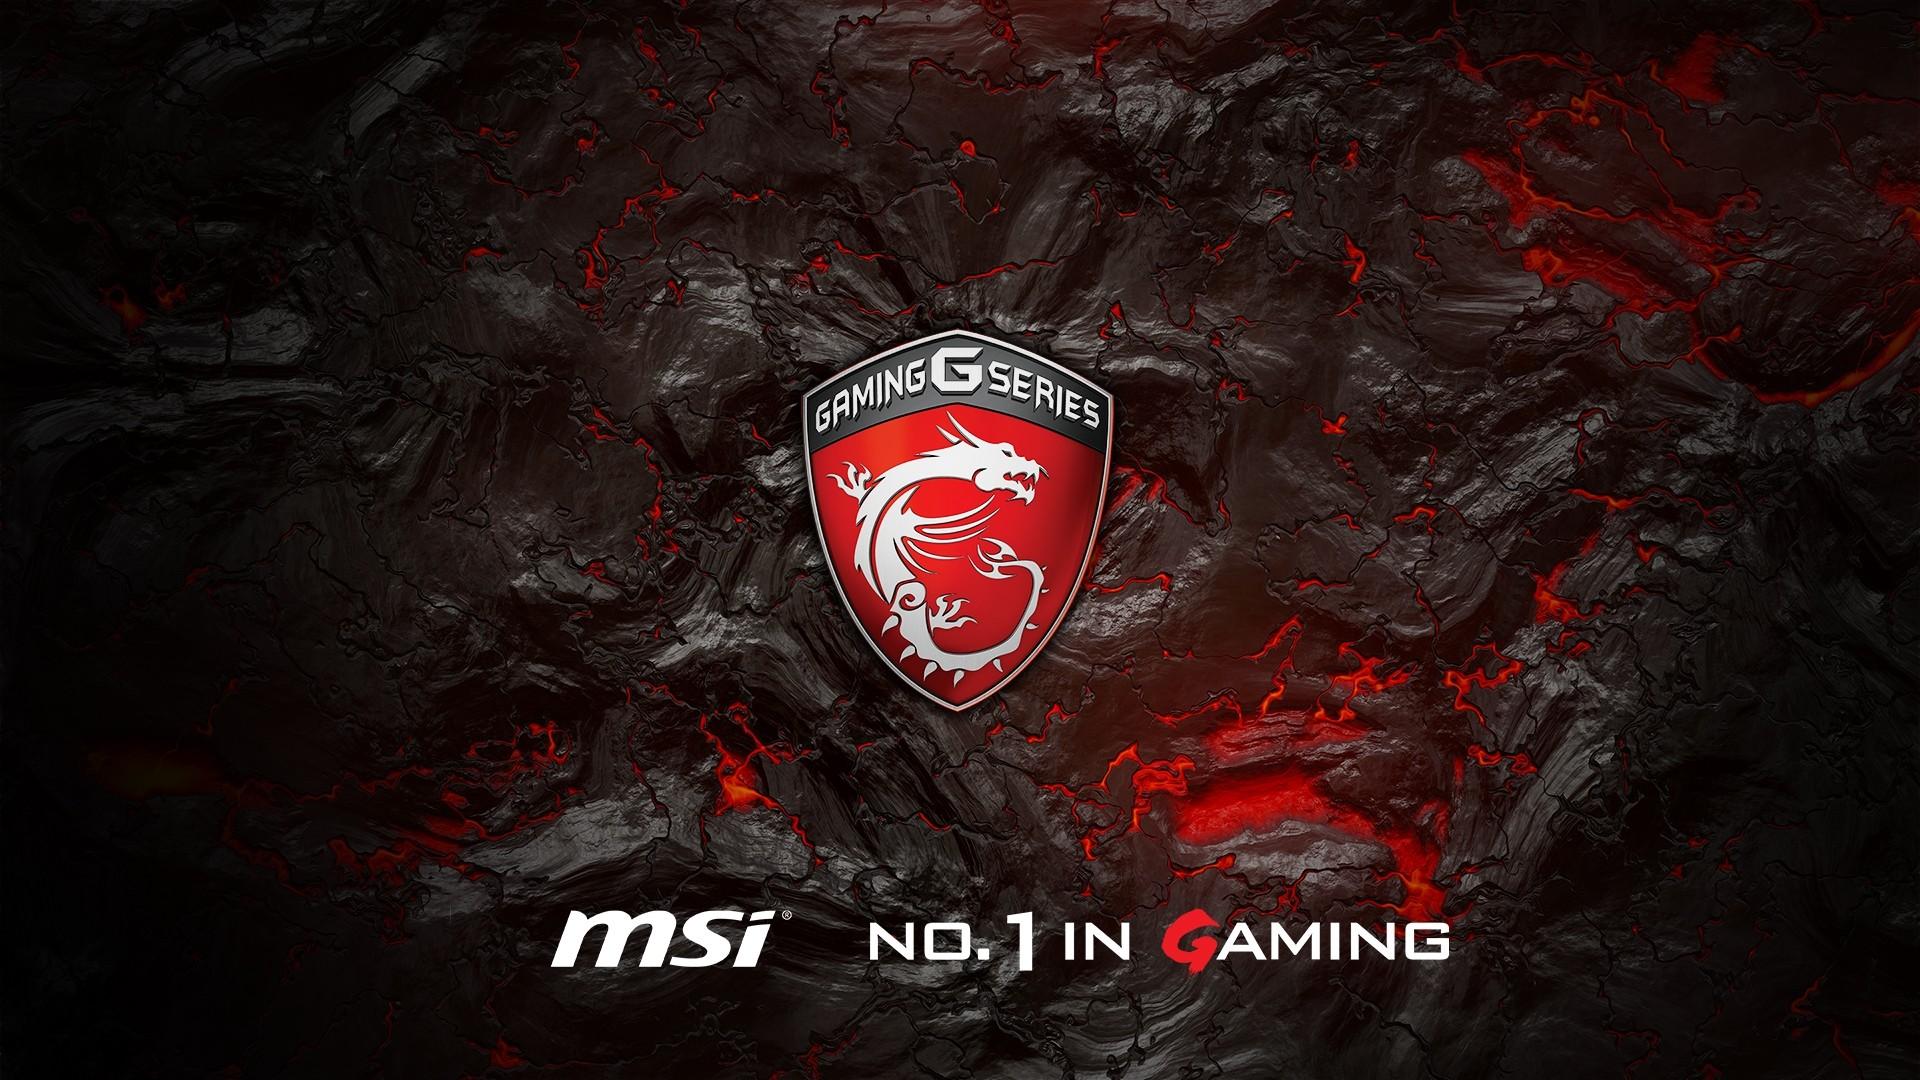 Download MSi Gaming G Series Dragon Logo Background Wallpaper |  Places to Visit | Pinterest